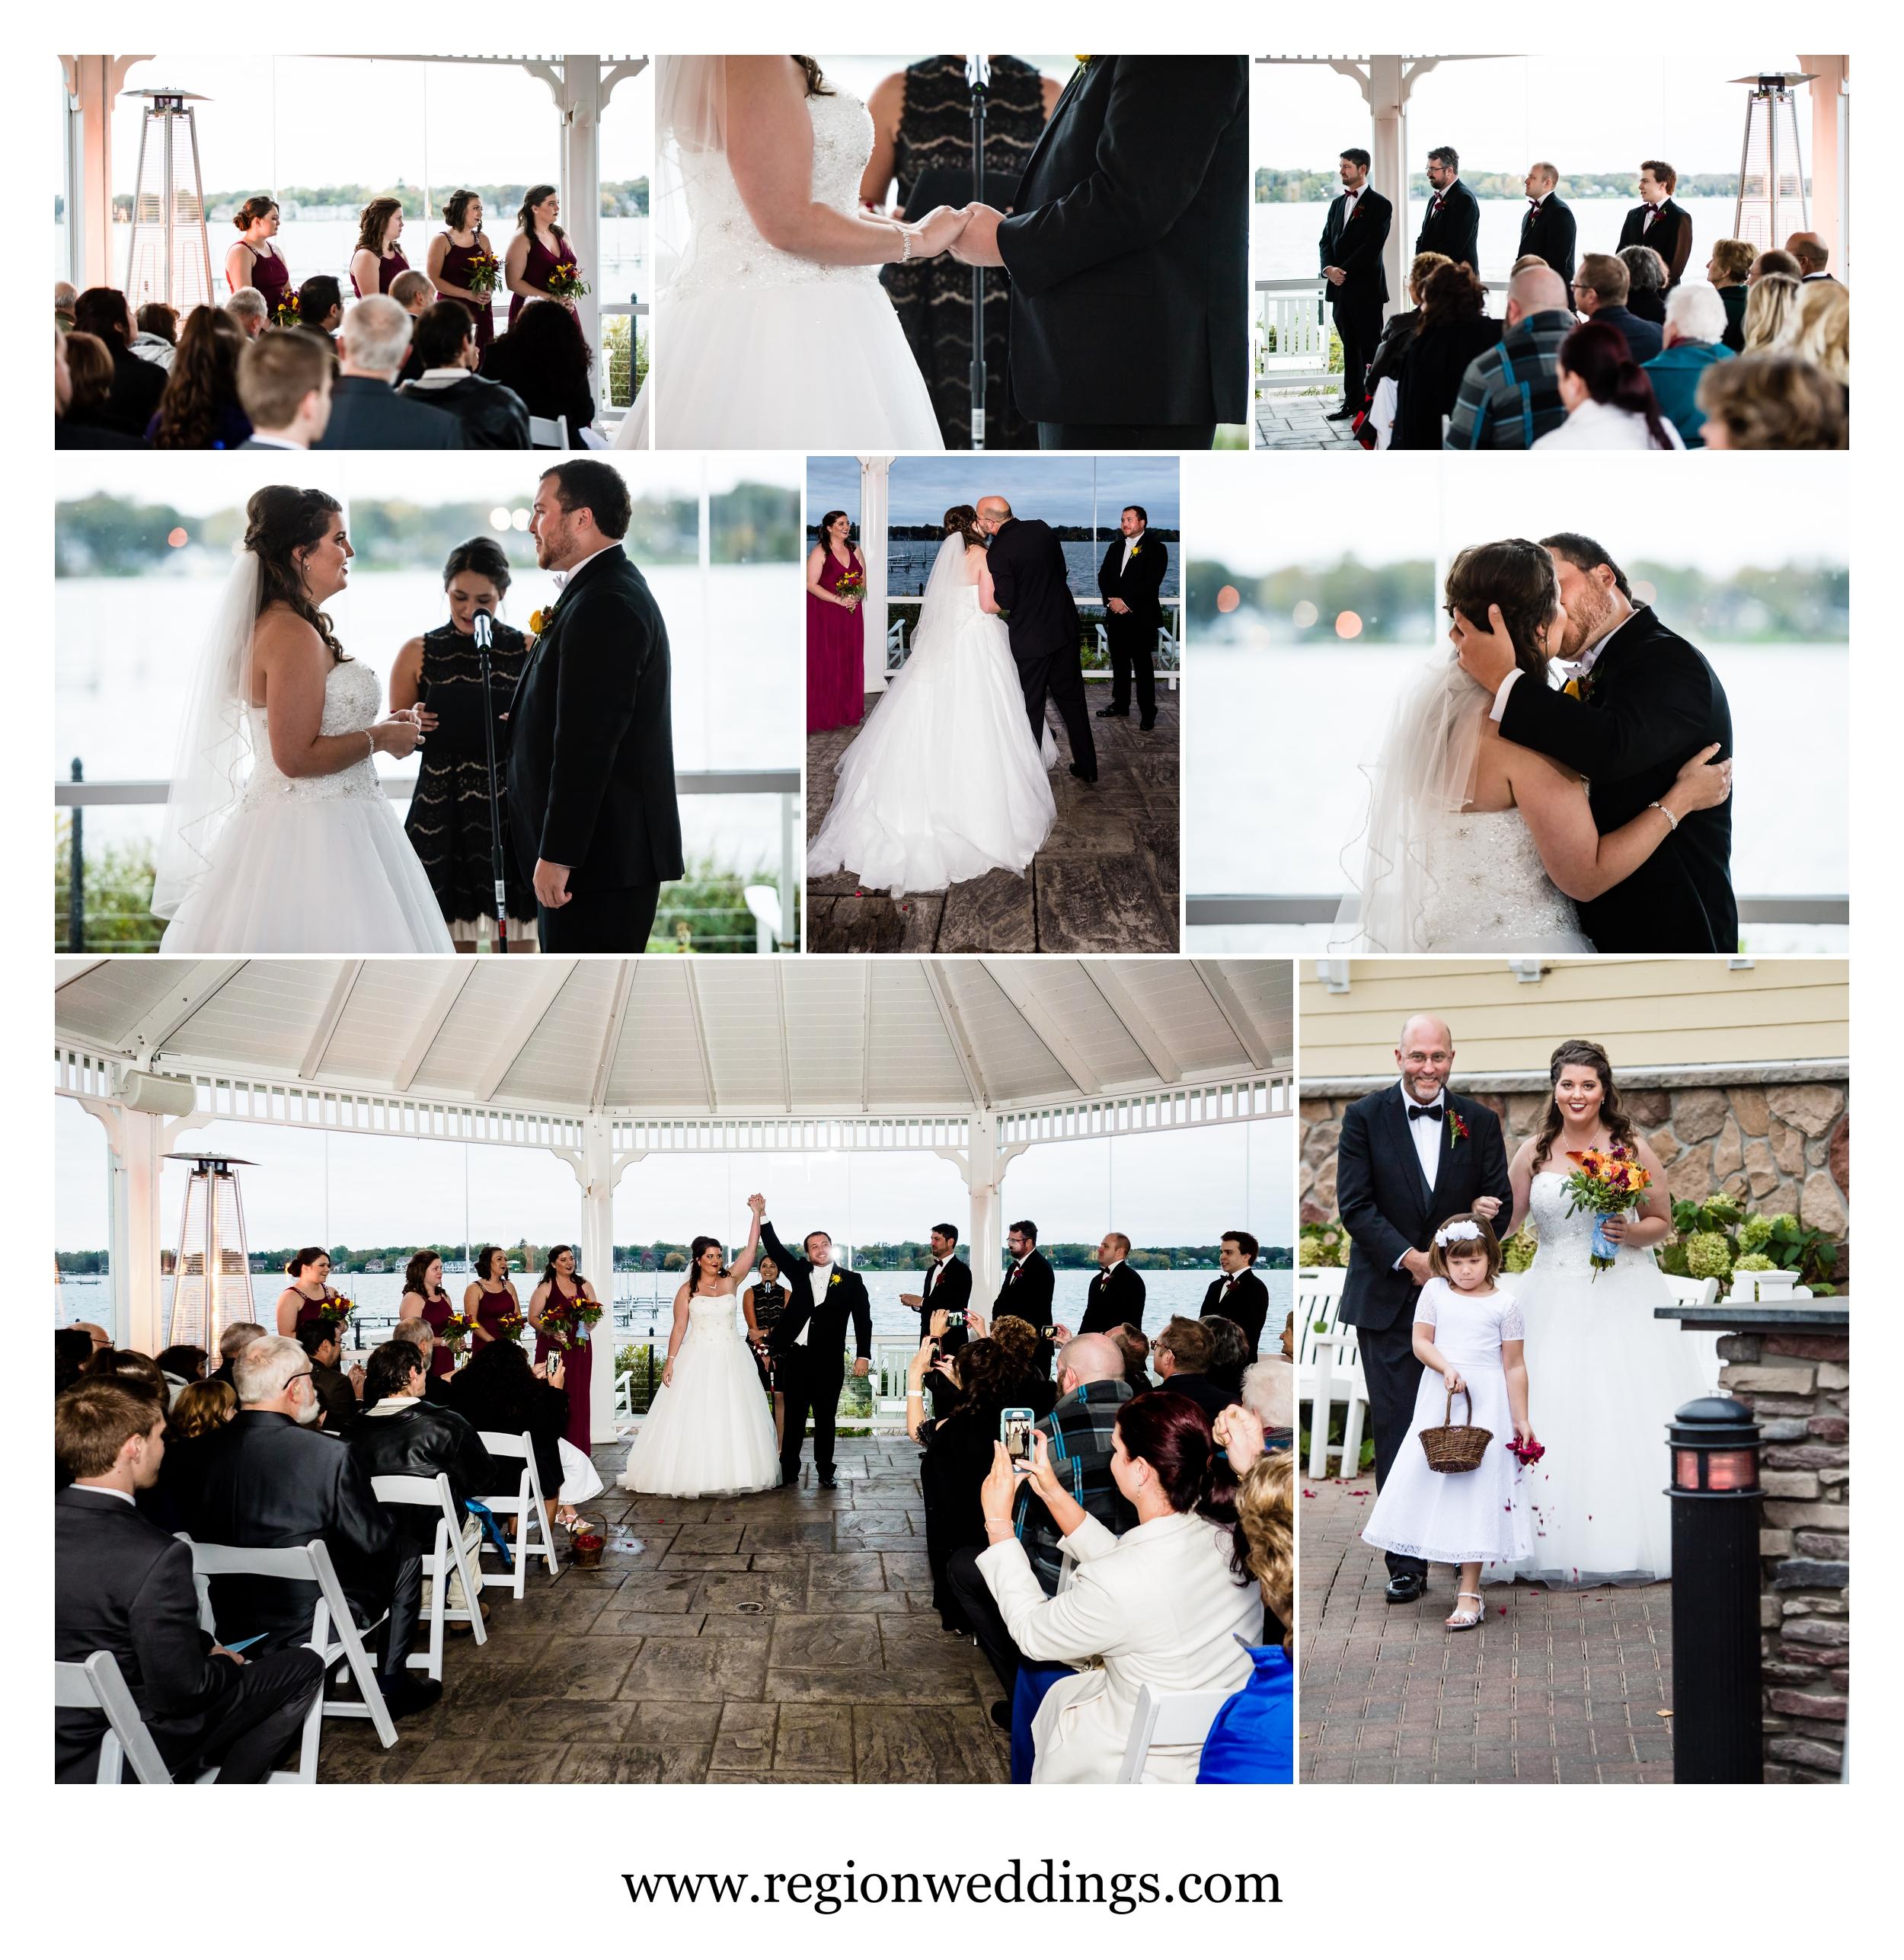 Outdoor Fall wedding ceremony at Lighthouse restaurant gazebo.